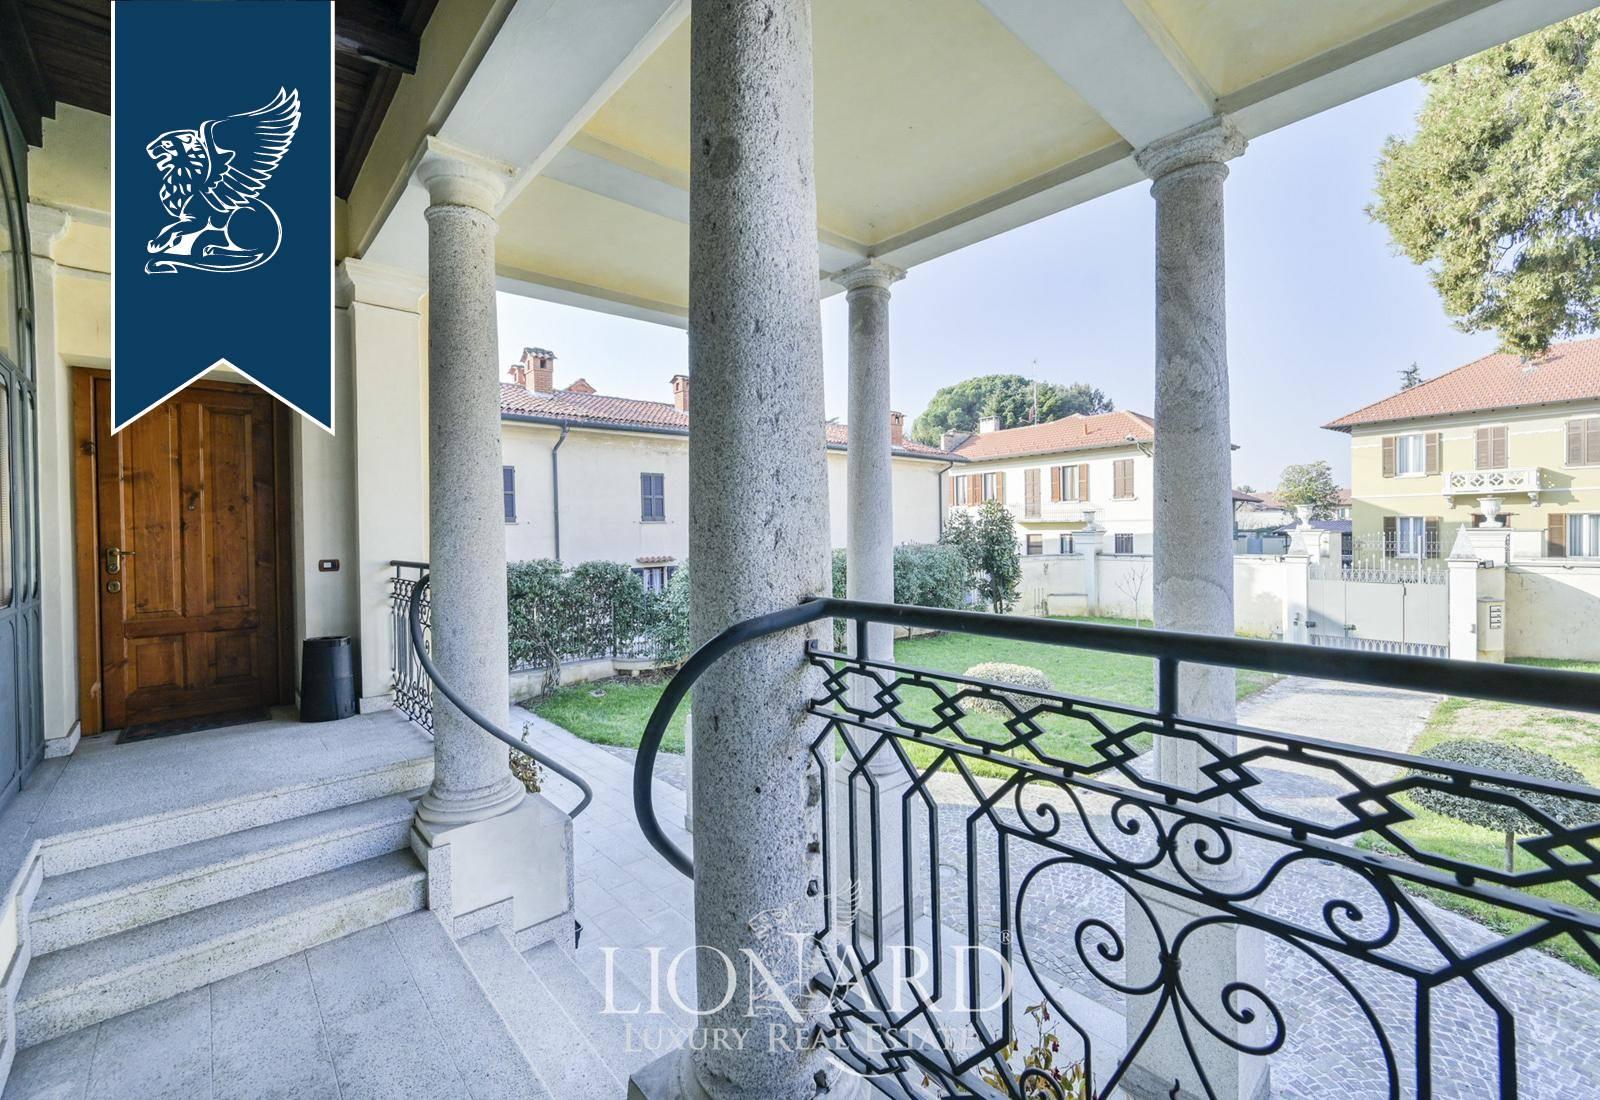 Villa in Vendita a Buscate: 0 locali, 890 mq - Foto 7